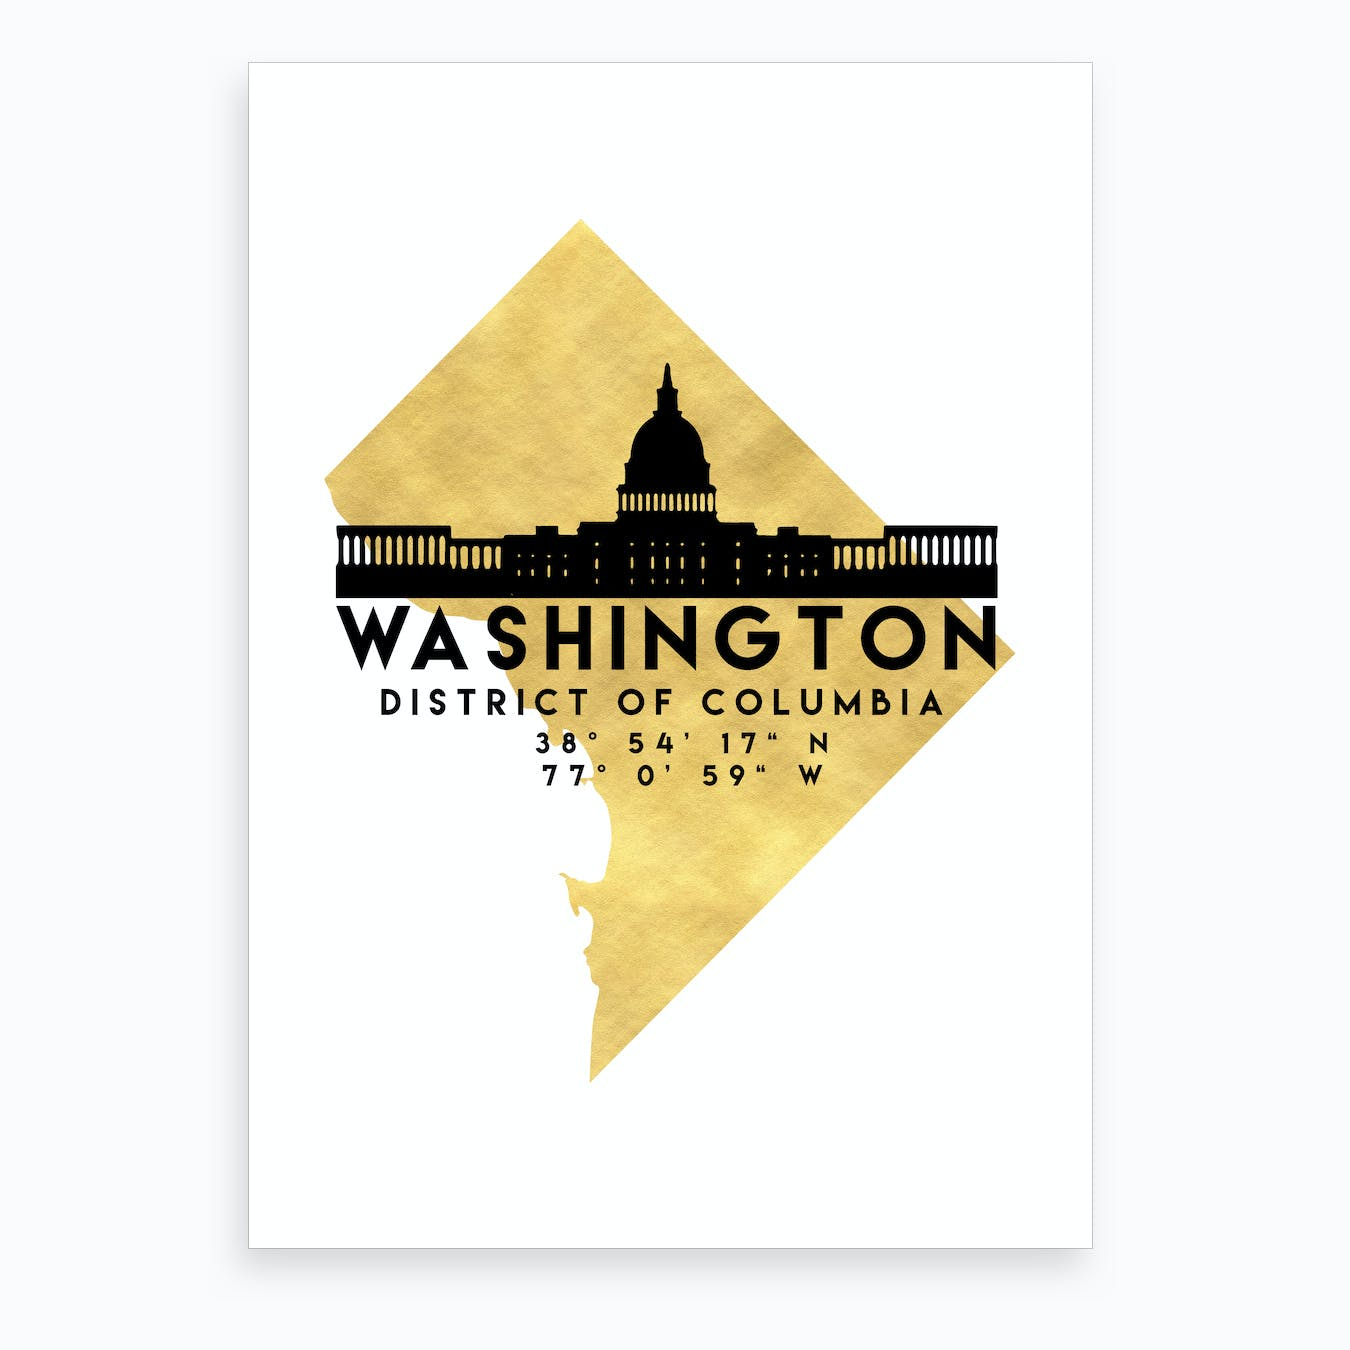 Washington District of Columbia Silhouette City Skyline Map